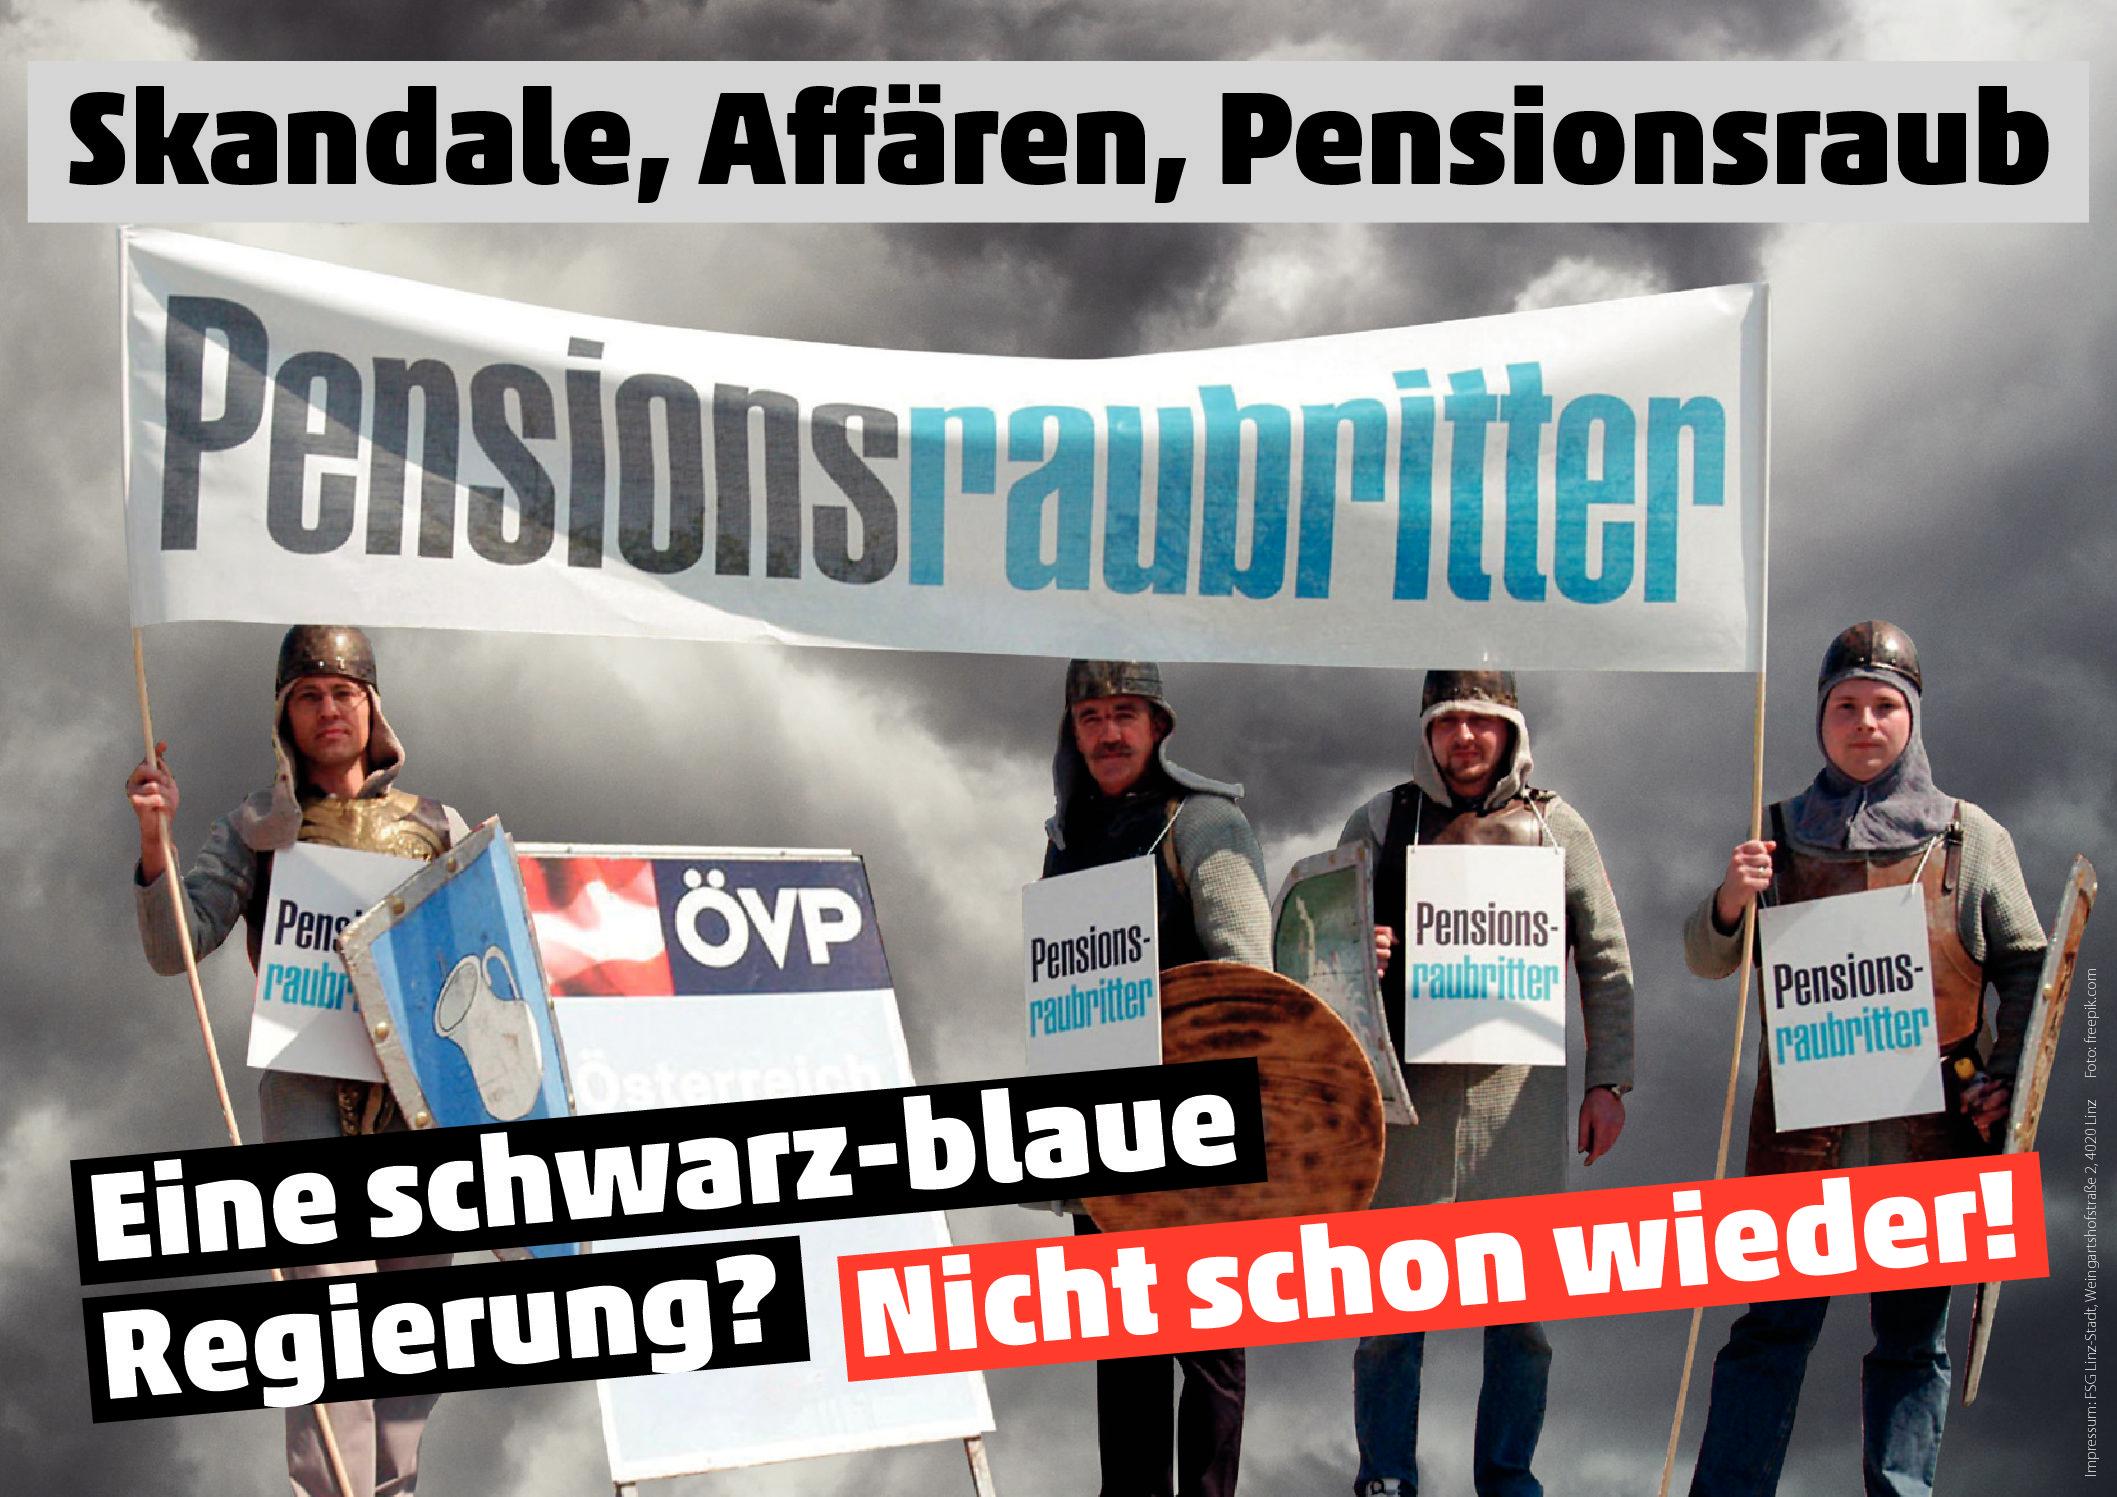 Neues Plakat: Schwarz-blau: Skandale, Affären, Pensionsraub